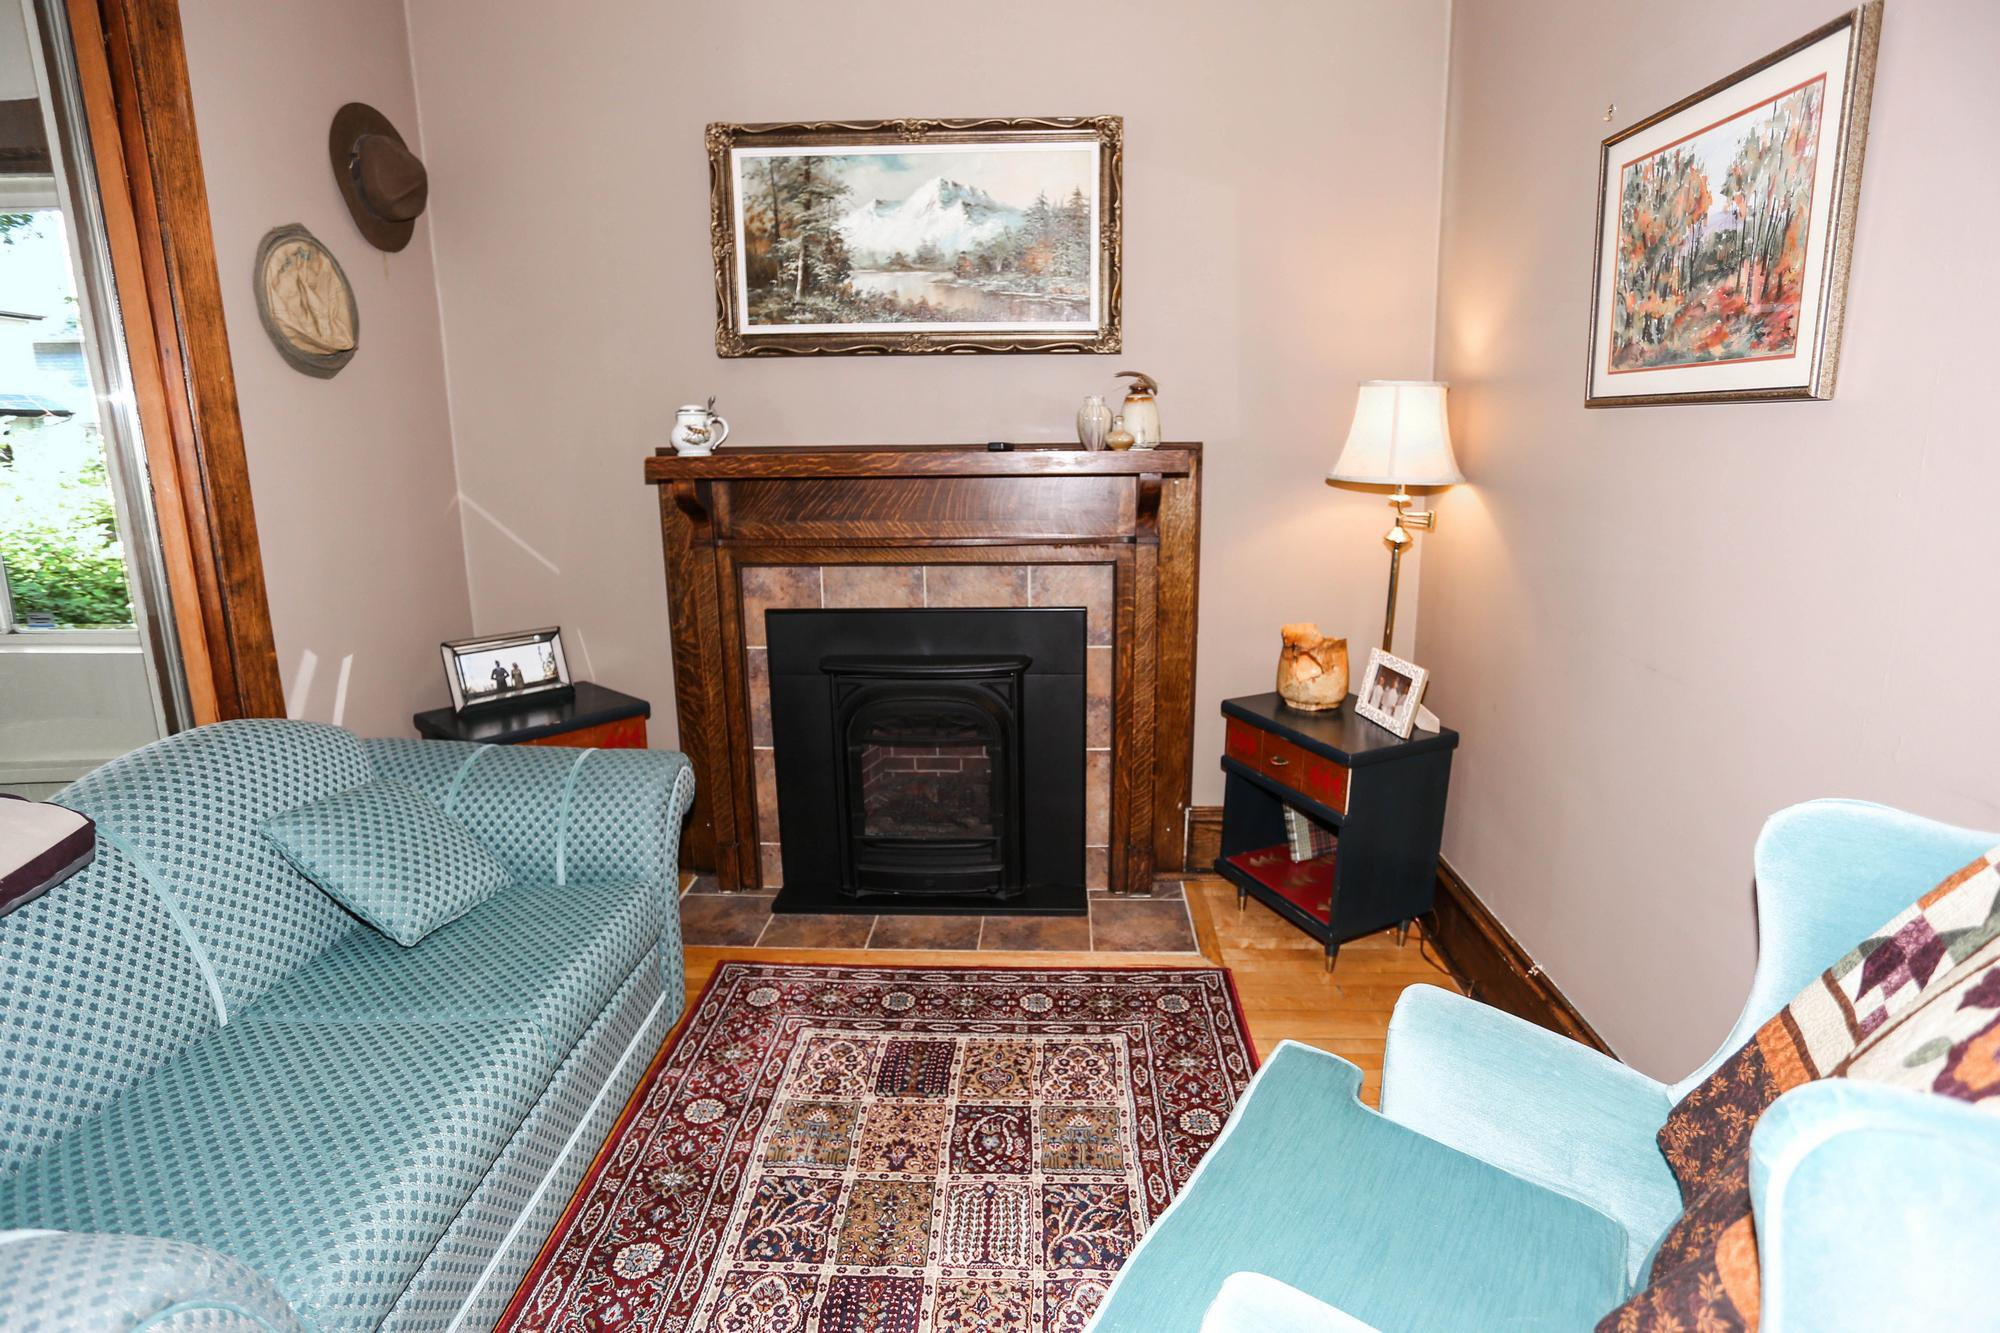 Photo 14: Photos: 105 Evanson Street in Winnipeg: Wolseley Single Family Detached for sale (5B)  : MLS®# 1821900